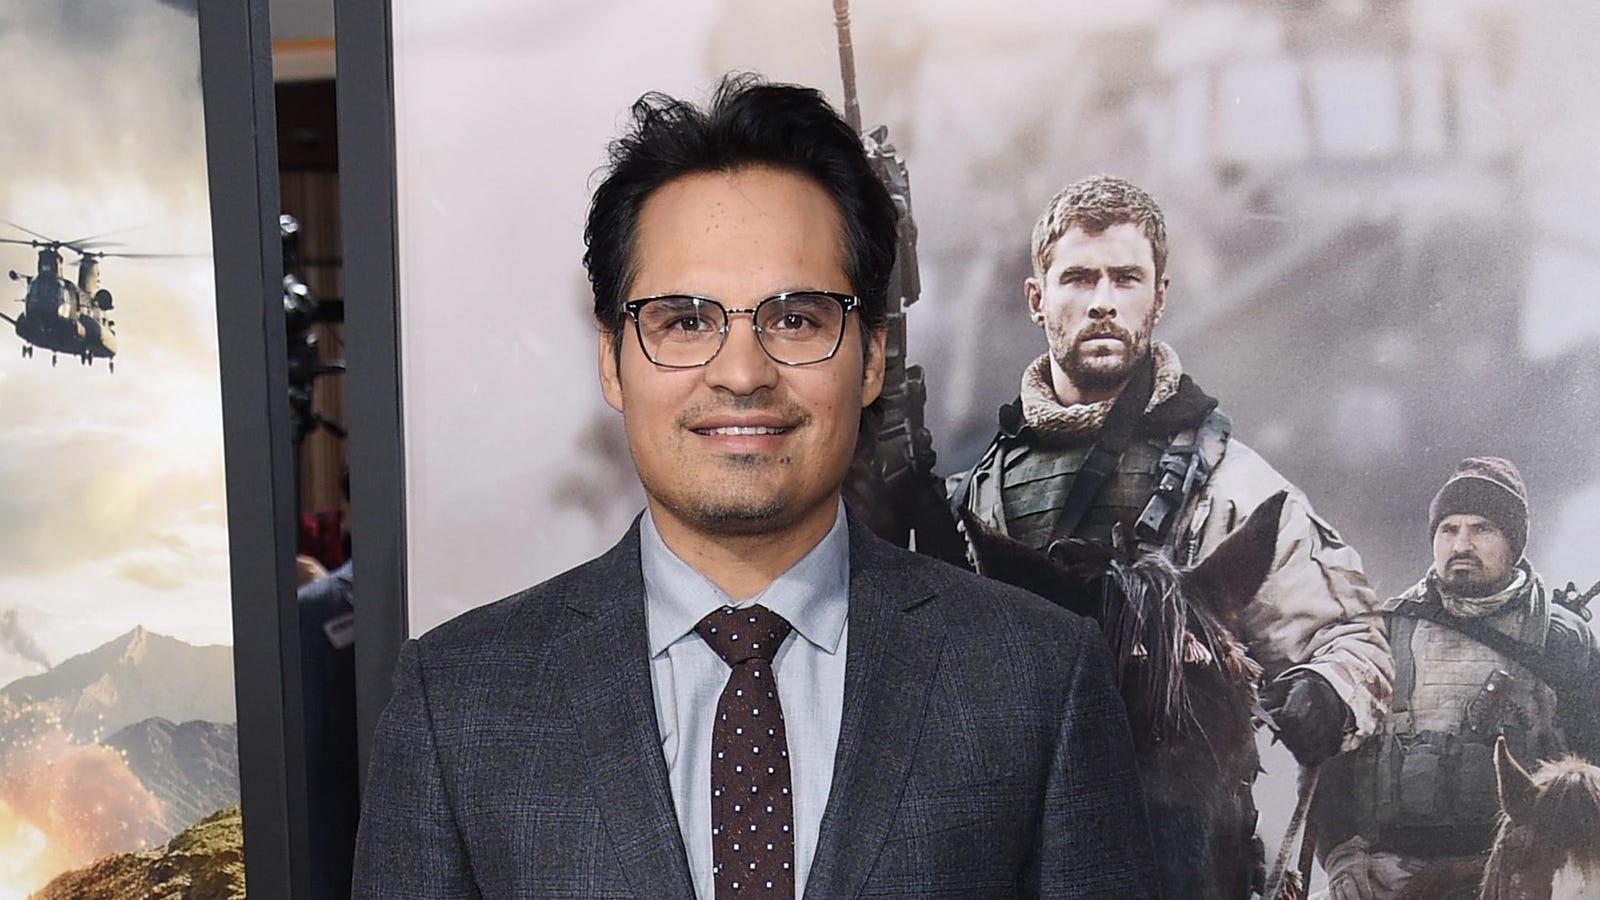 Michael Peña to play Mr. Roarke in a Fantasy Island movie